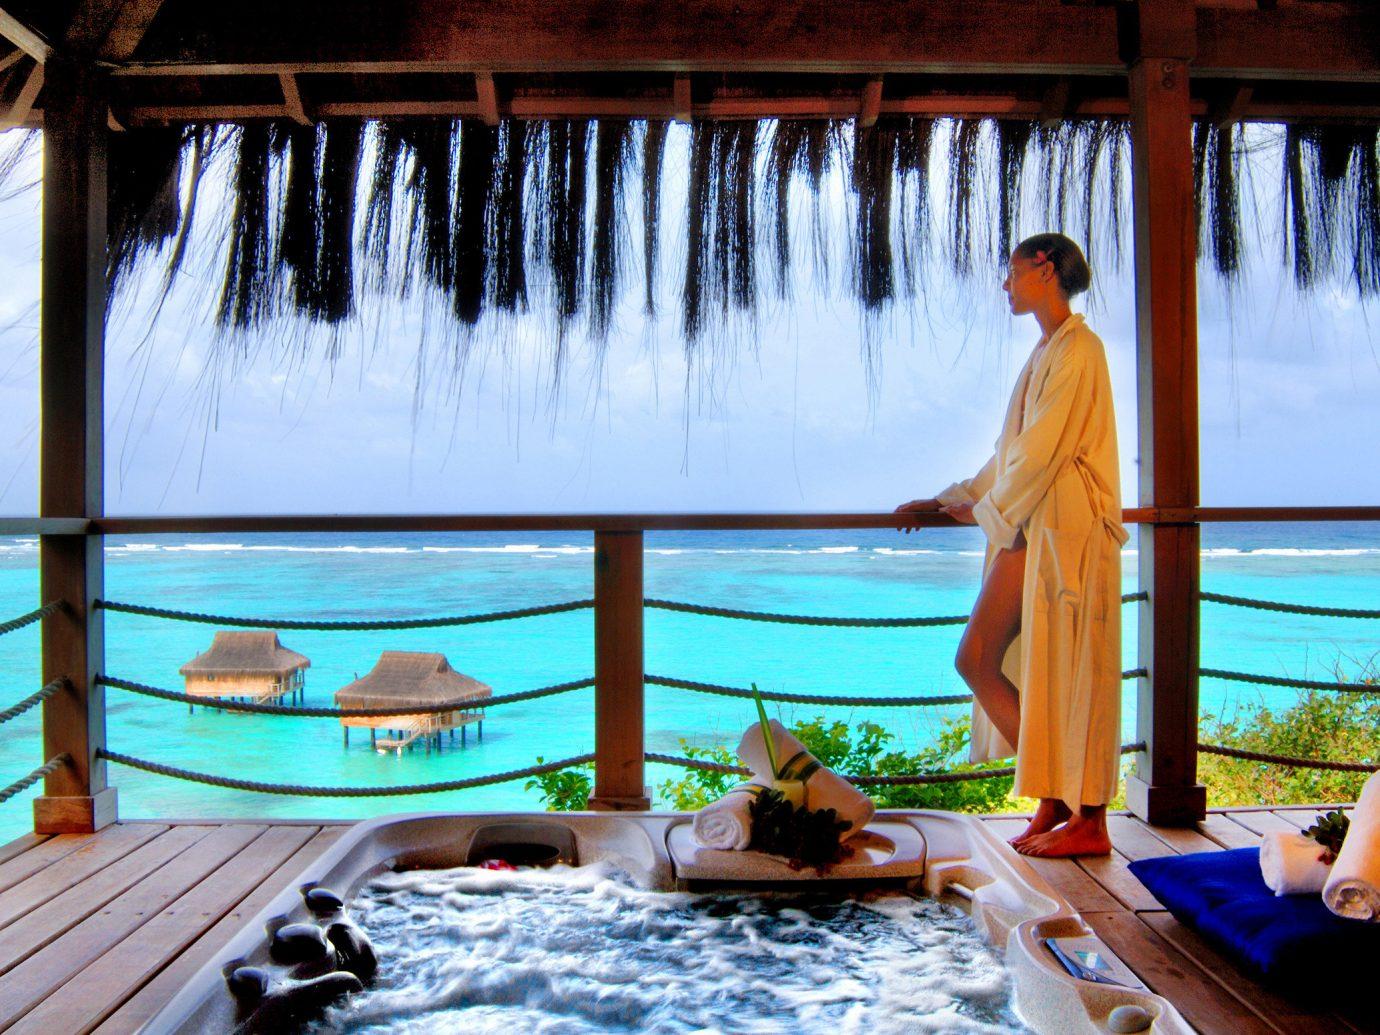 Hotels indoor leisure swimming pool window vacation Resort estate overlooking